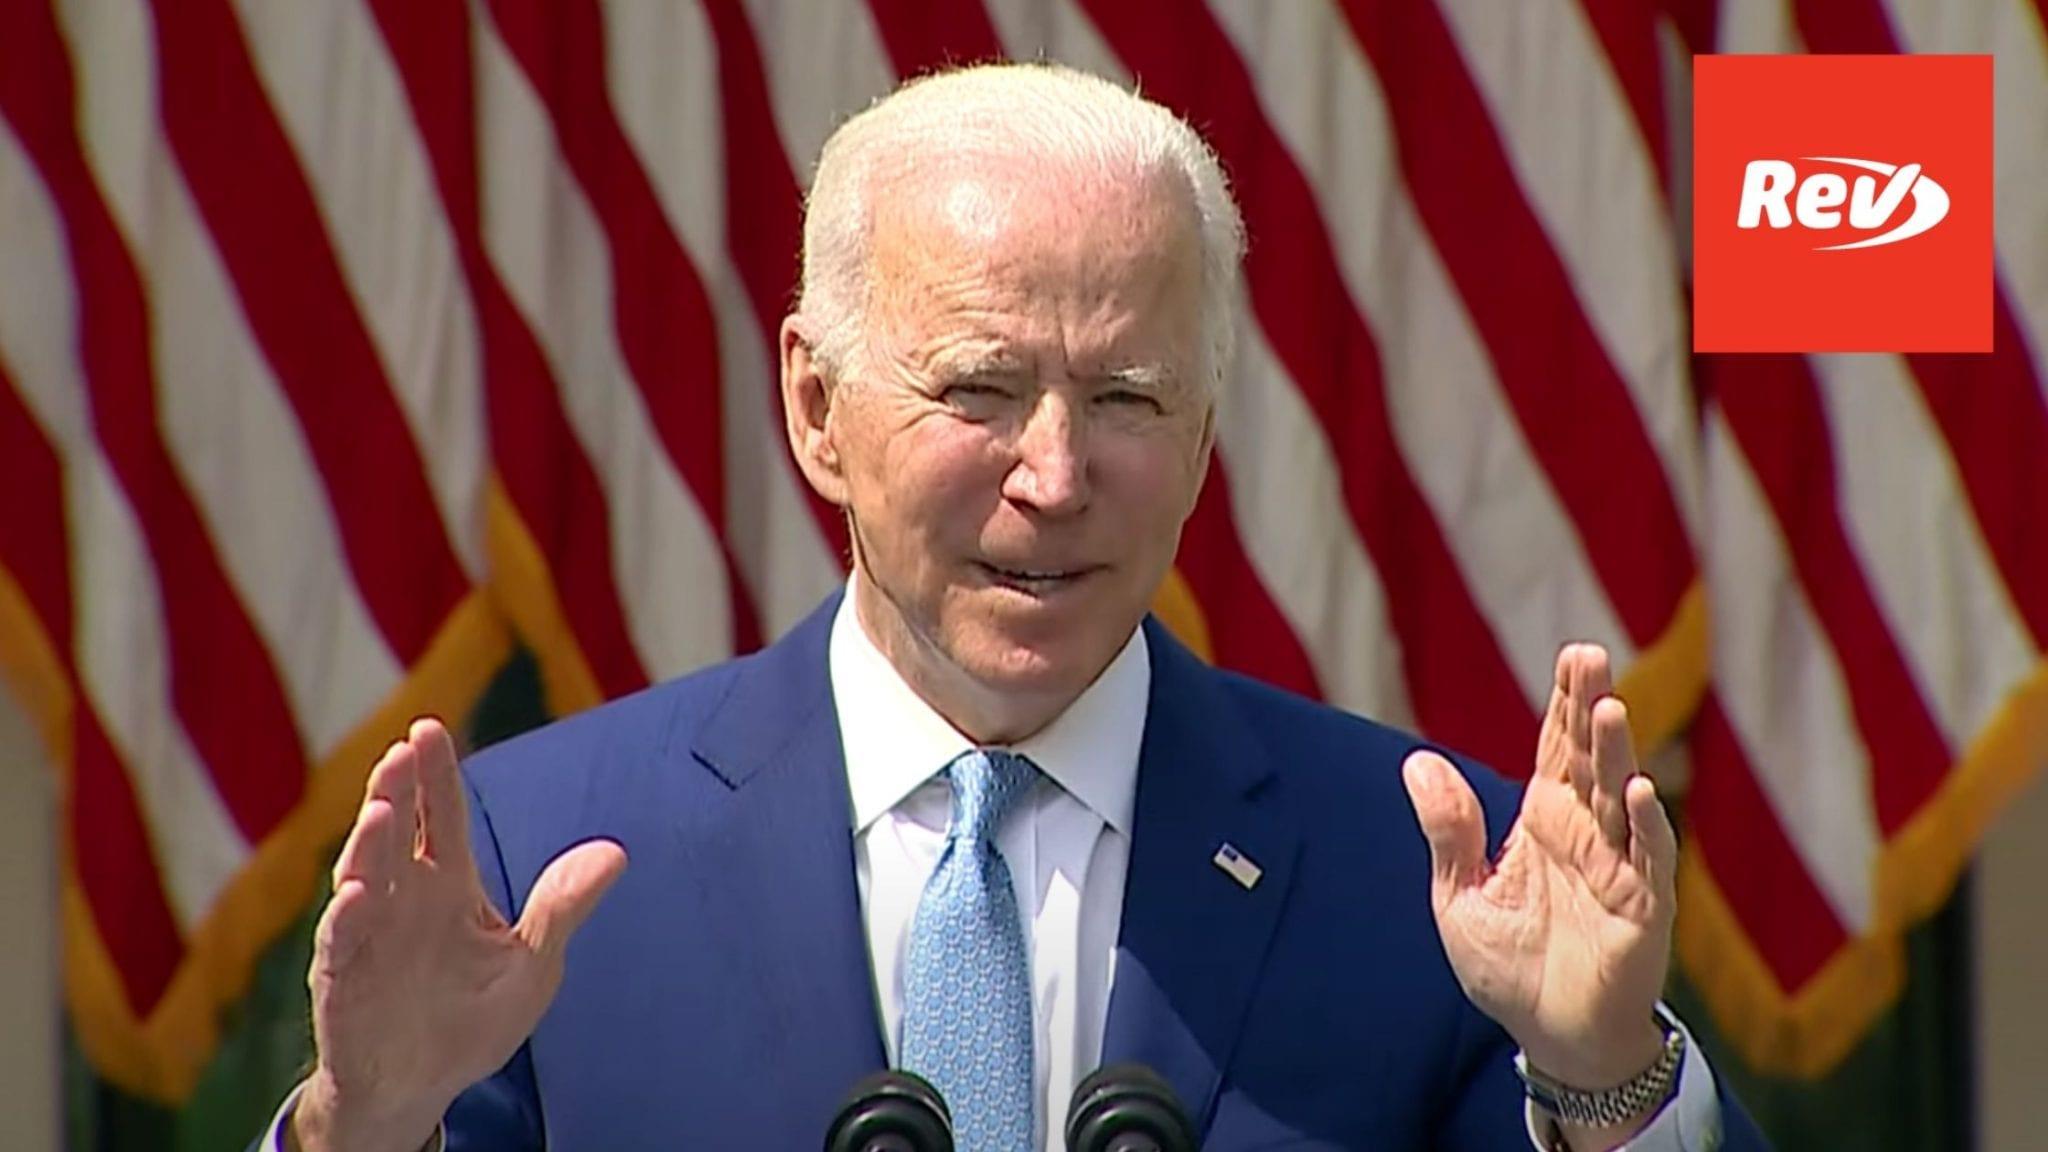 Joe Biden, Merrick Garland Press Conference Transcript: Action on Gun Violence Prevention